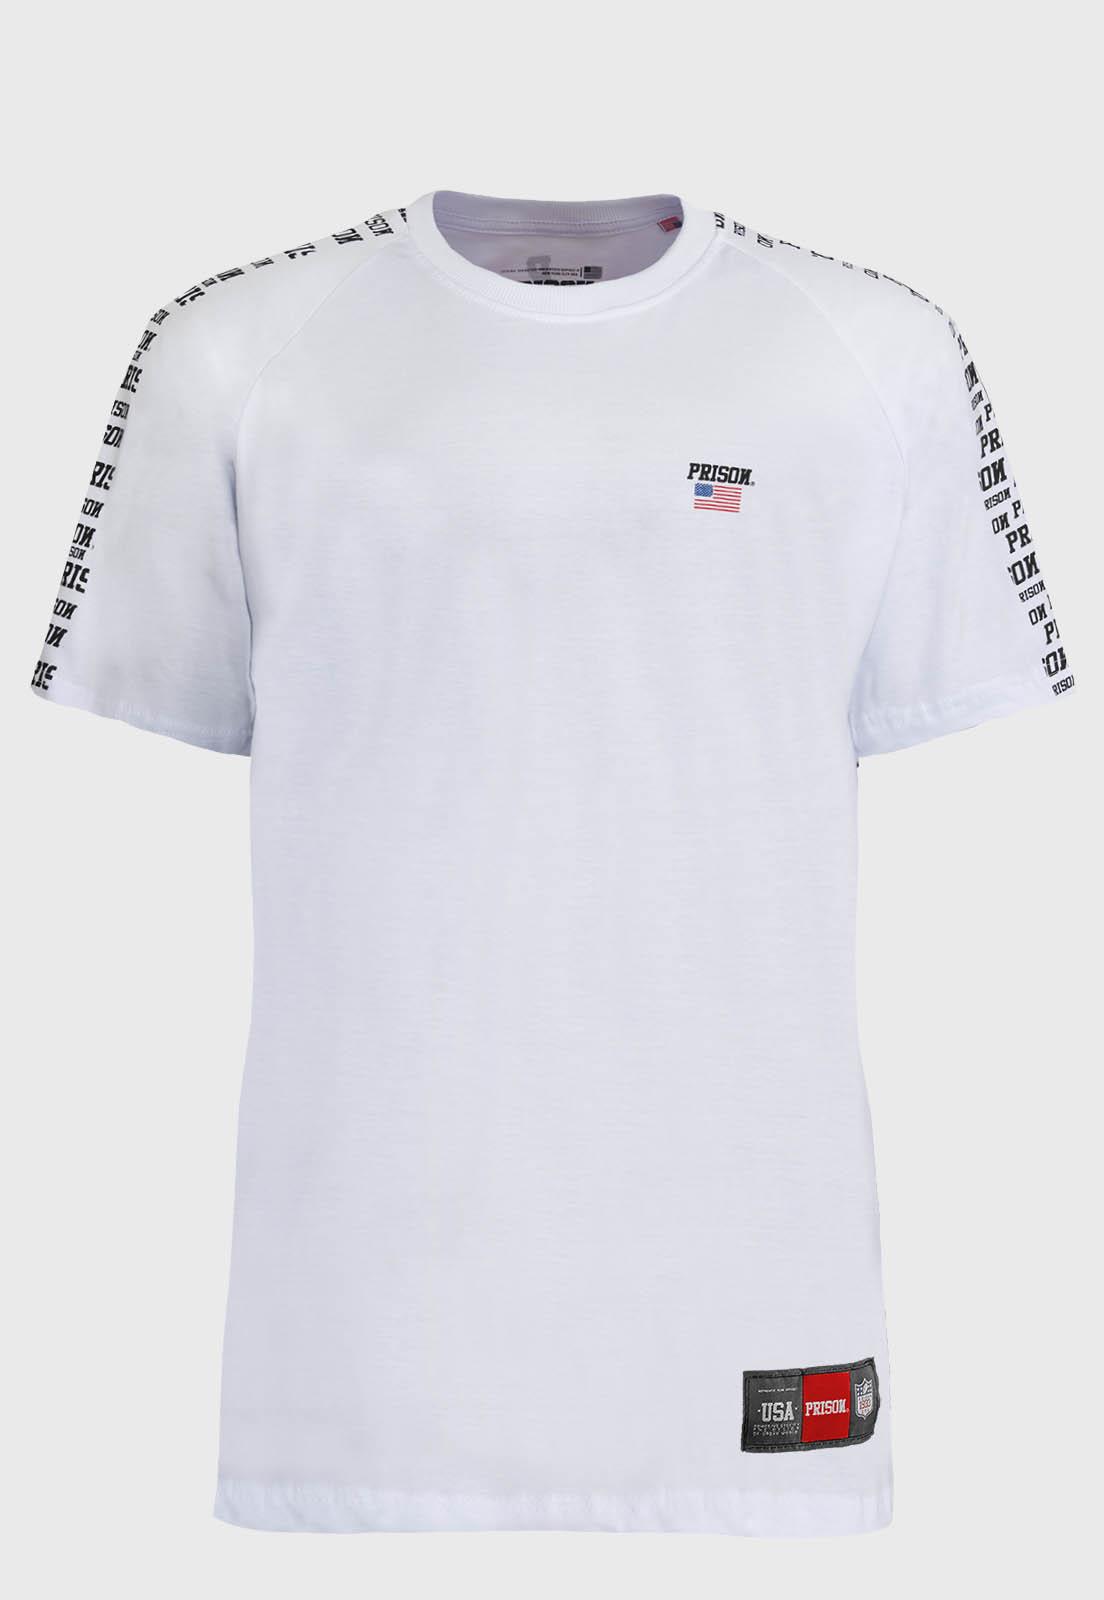 Camiseta Raglan Prison  the Future